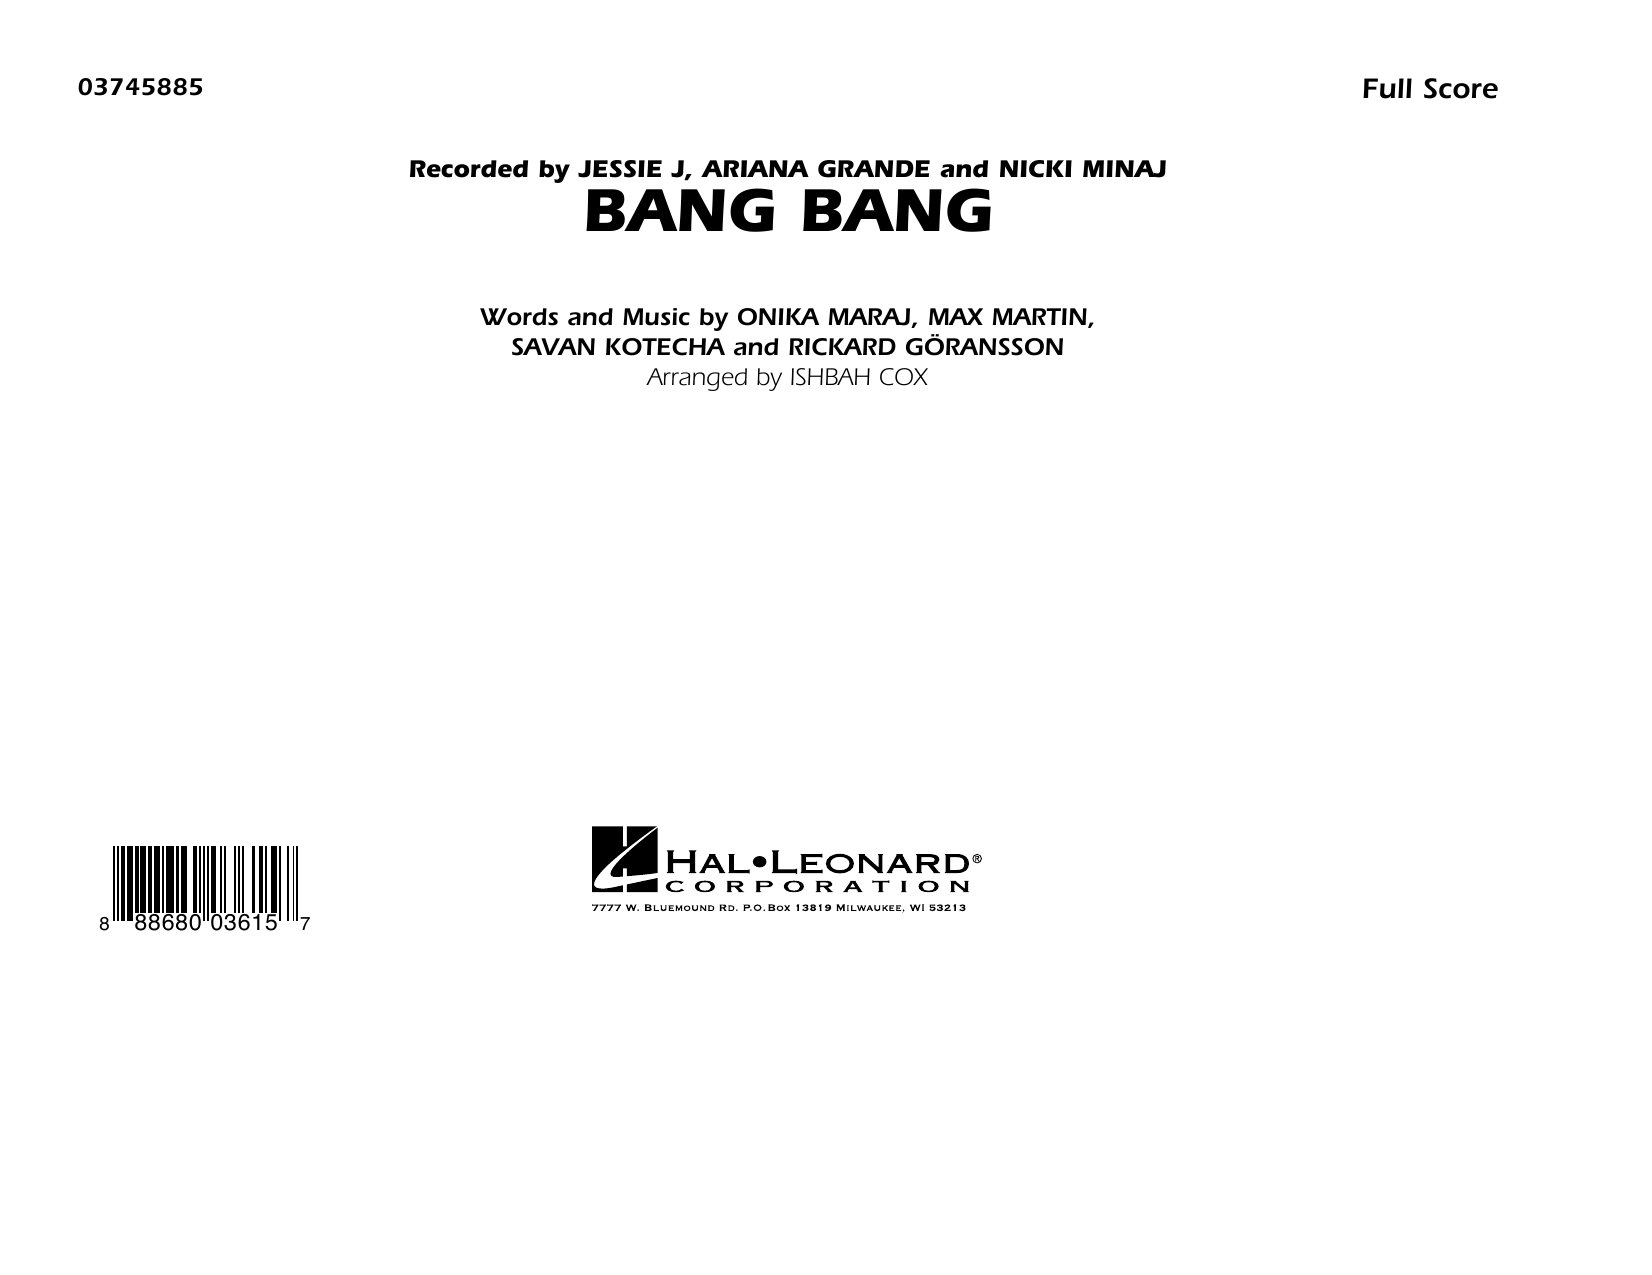 Bang Bang (COMPLETE) sheet music for marching band by Ishbah Cox